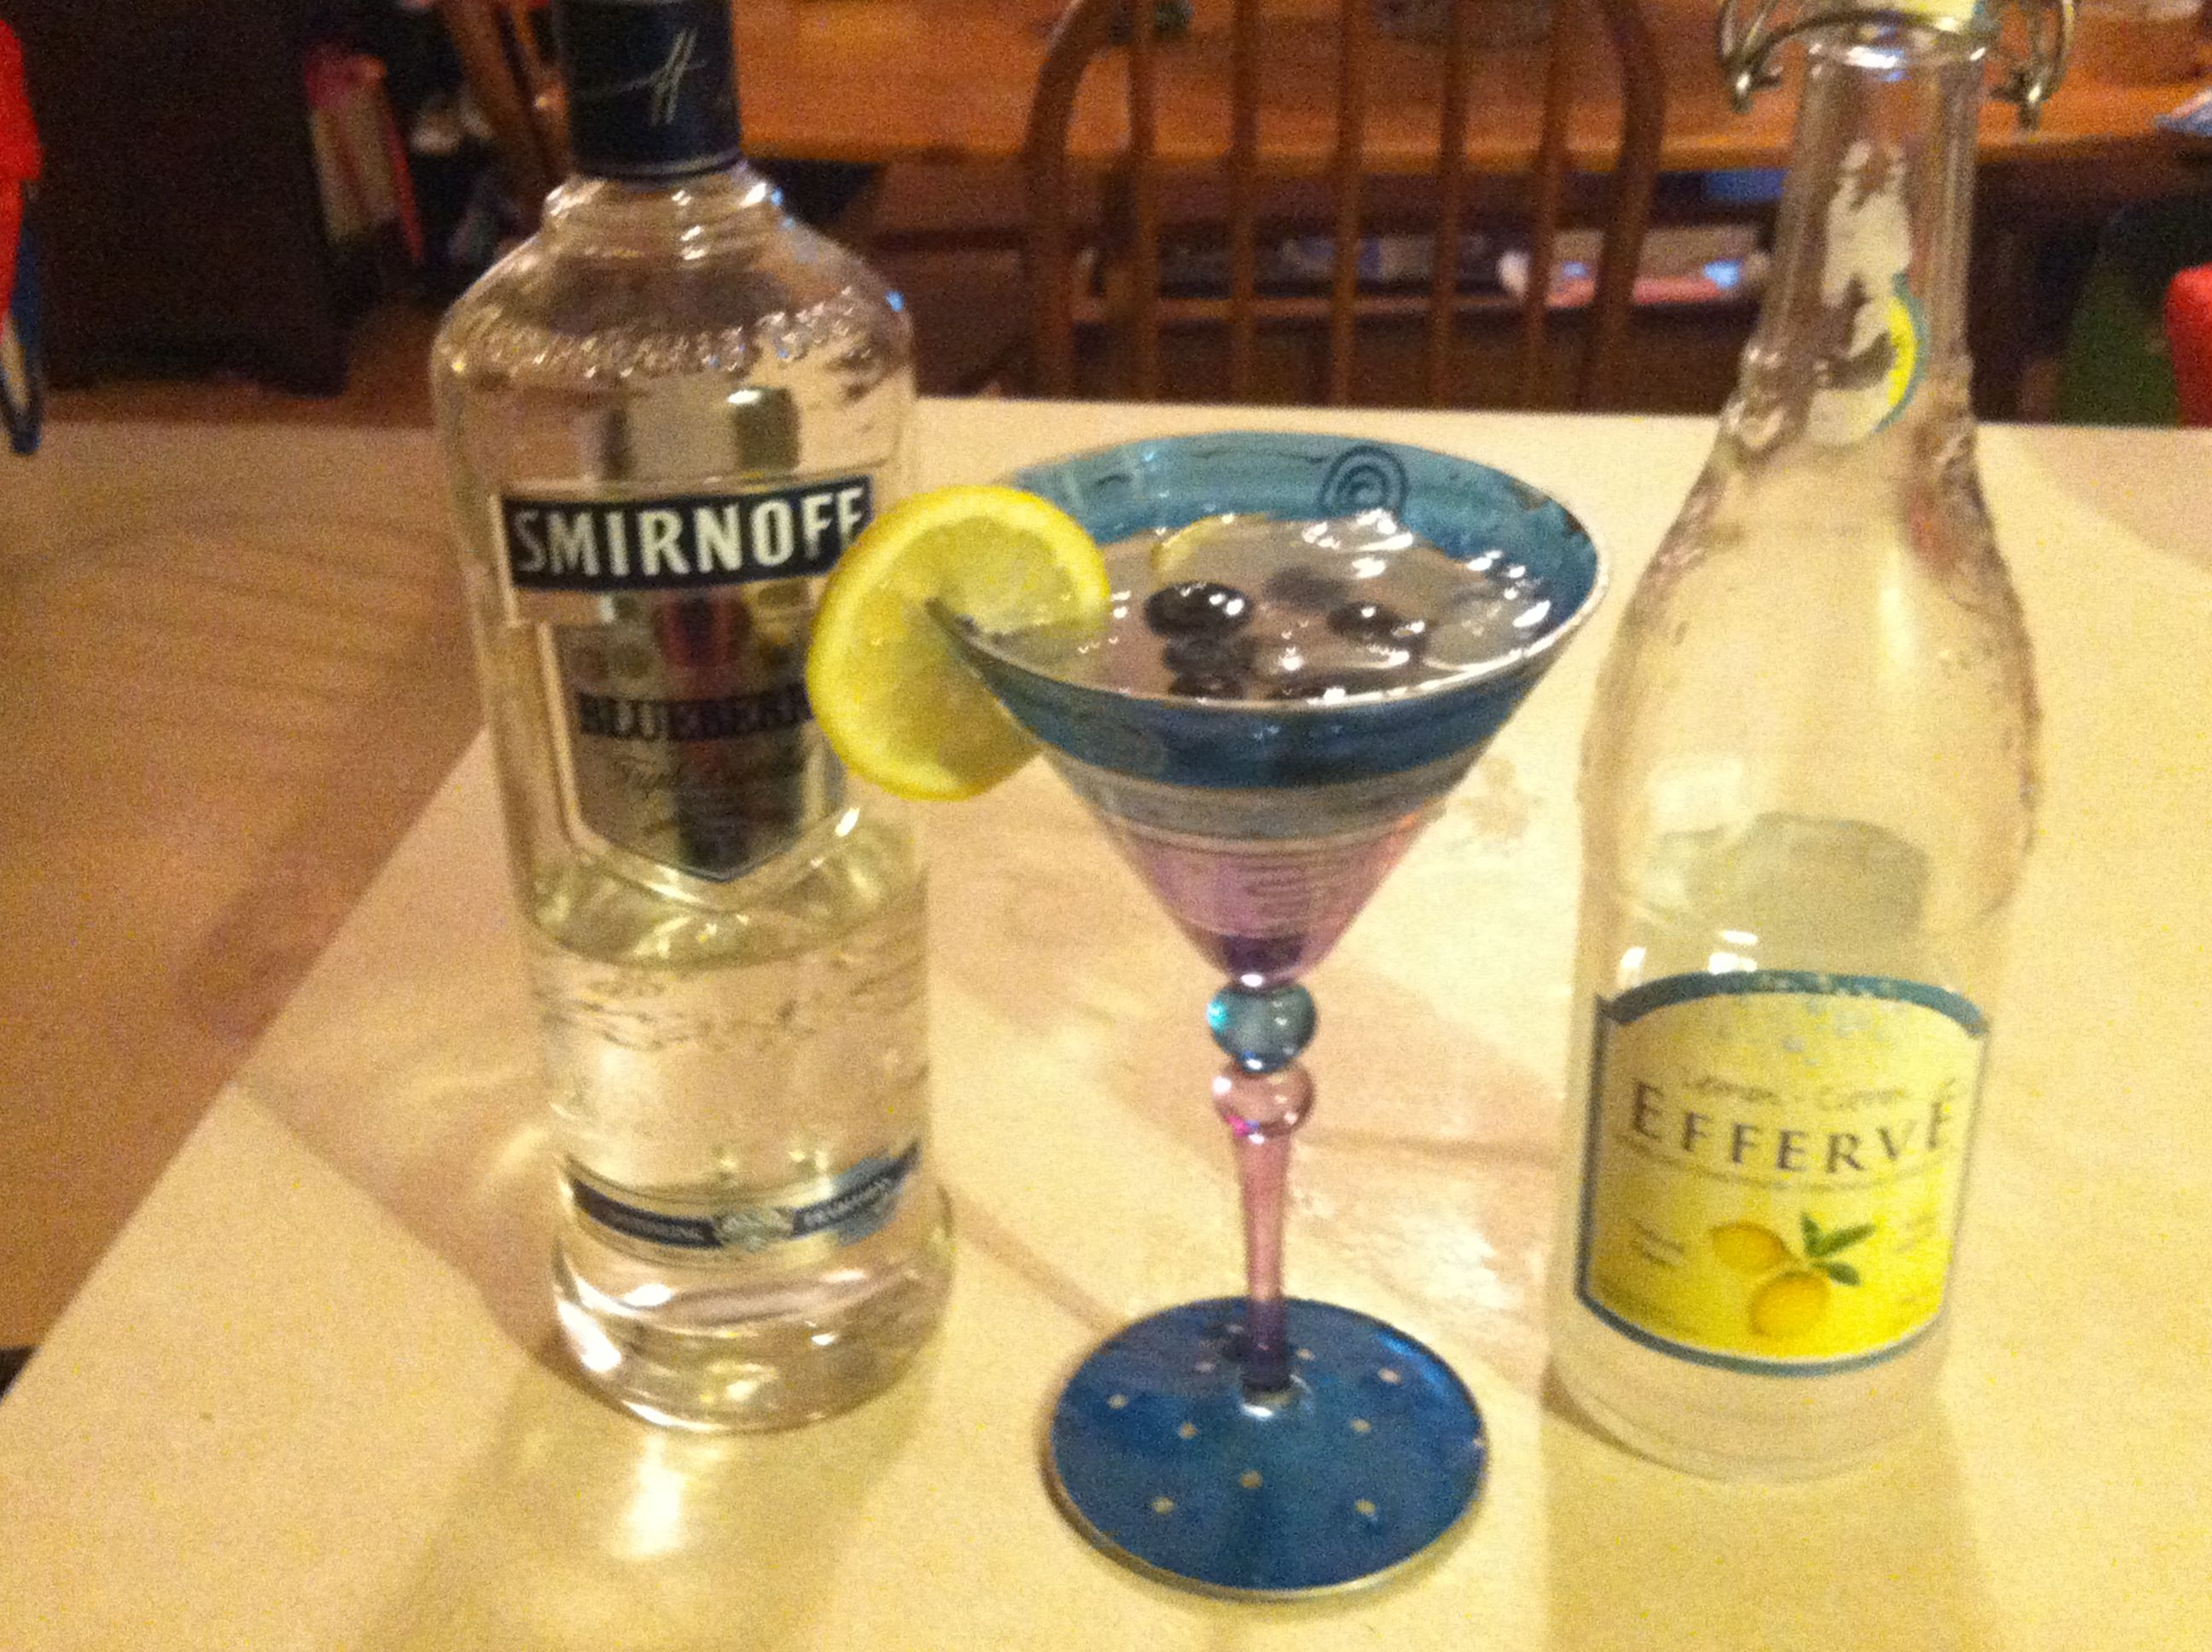 Lemonblueberry martini 2oz blueberry vodka sparkling